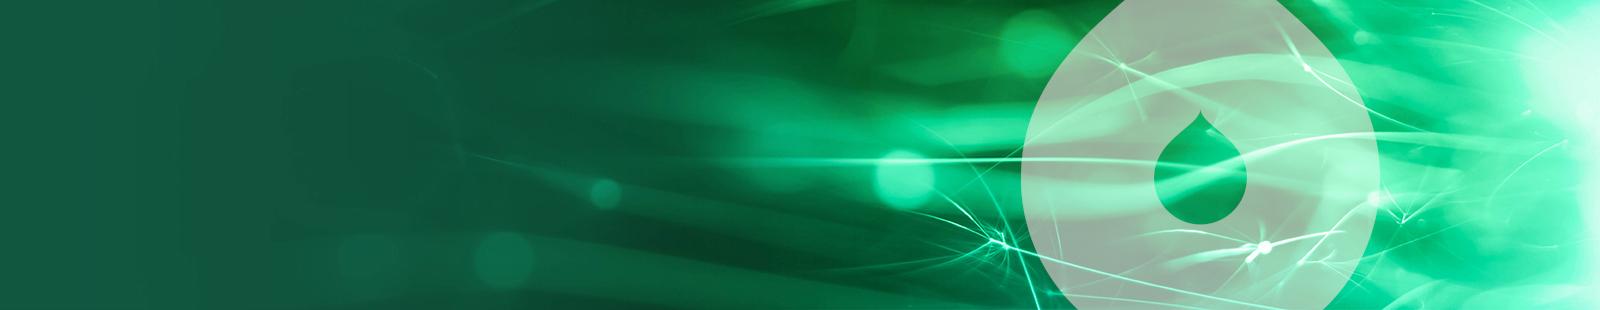 Nels Banner image